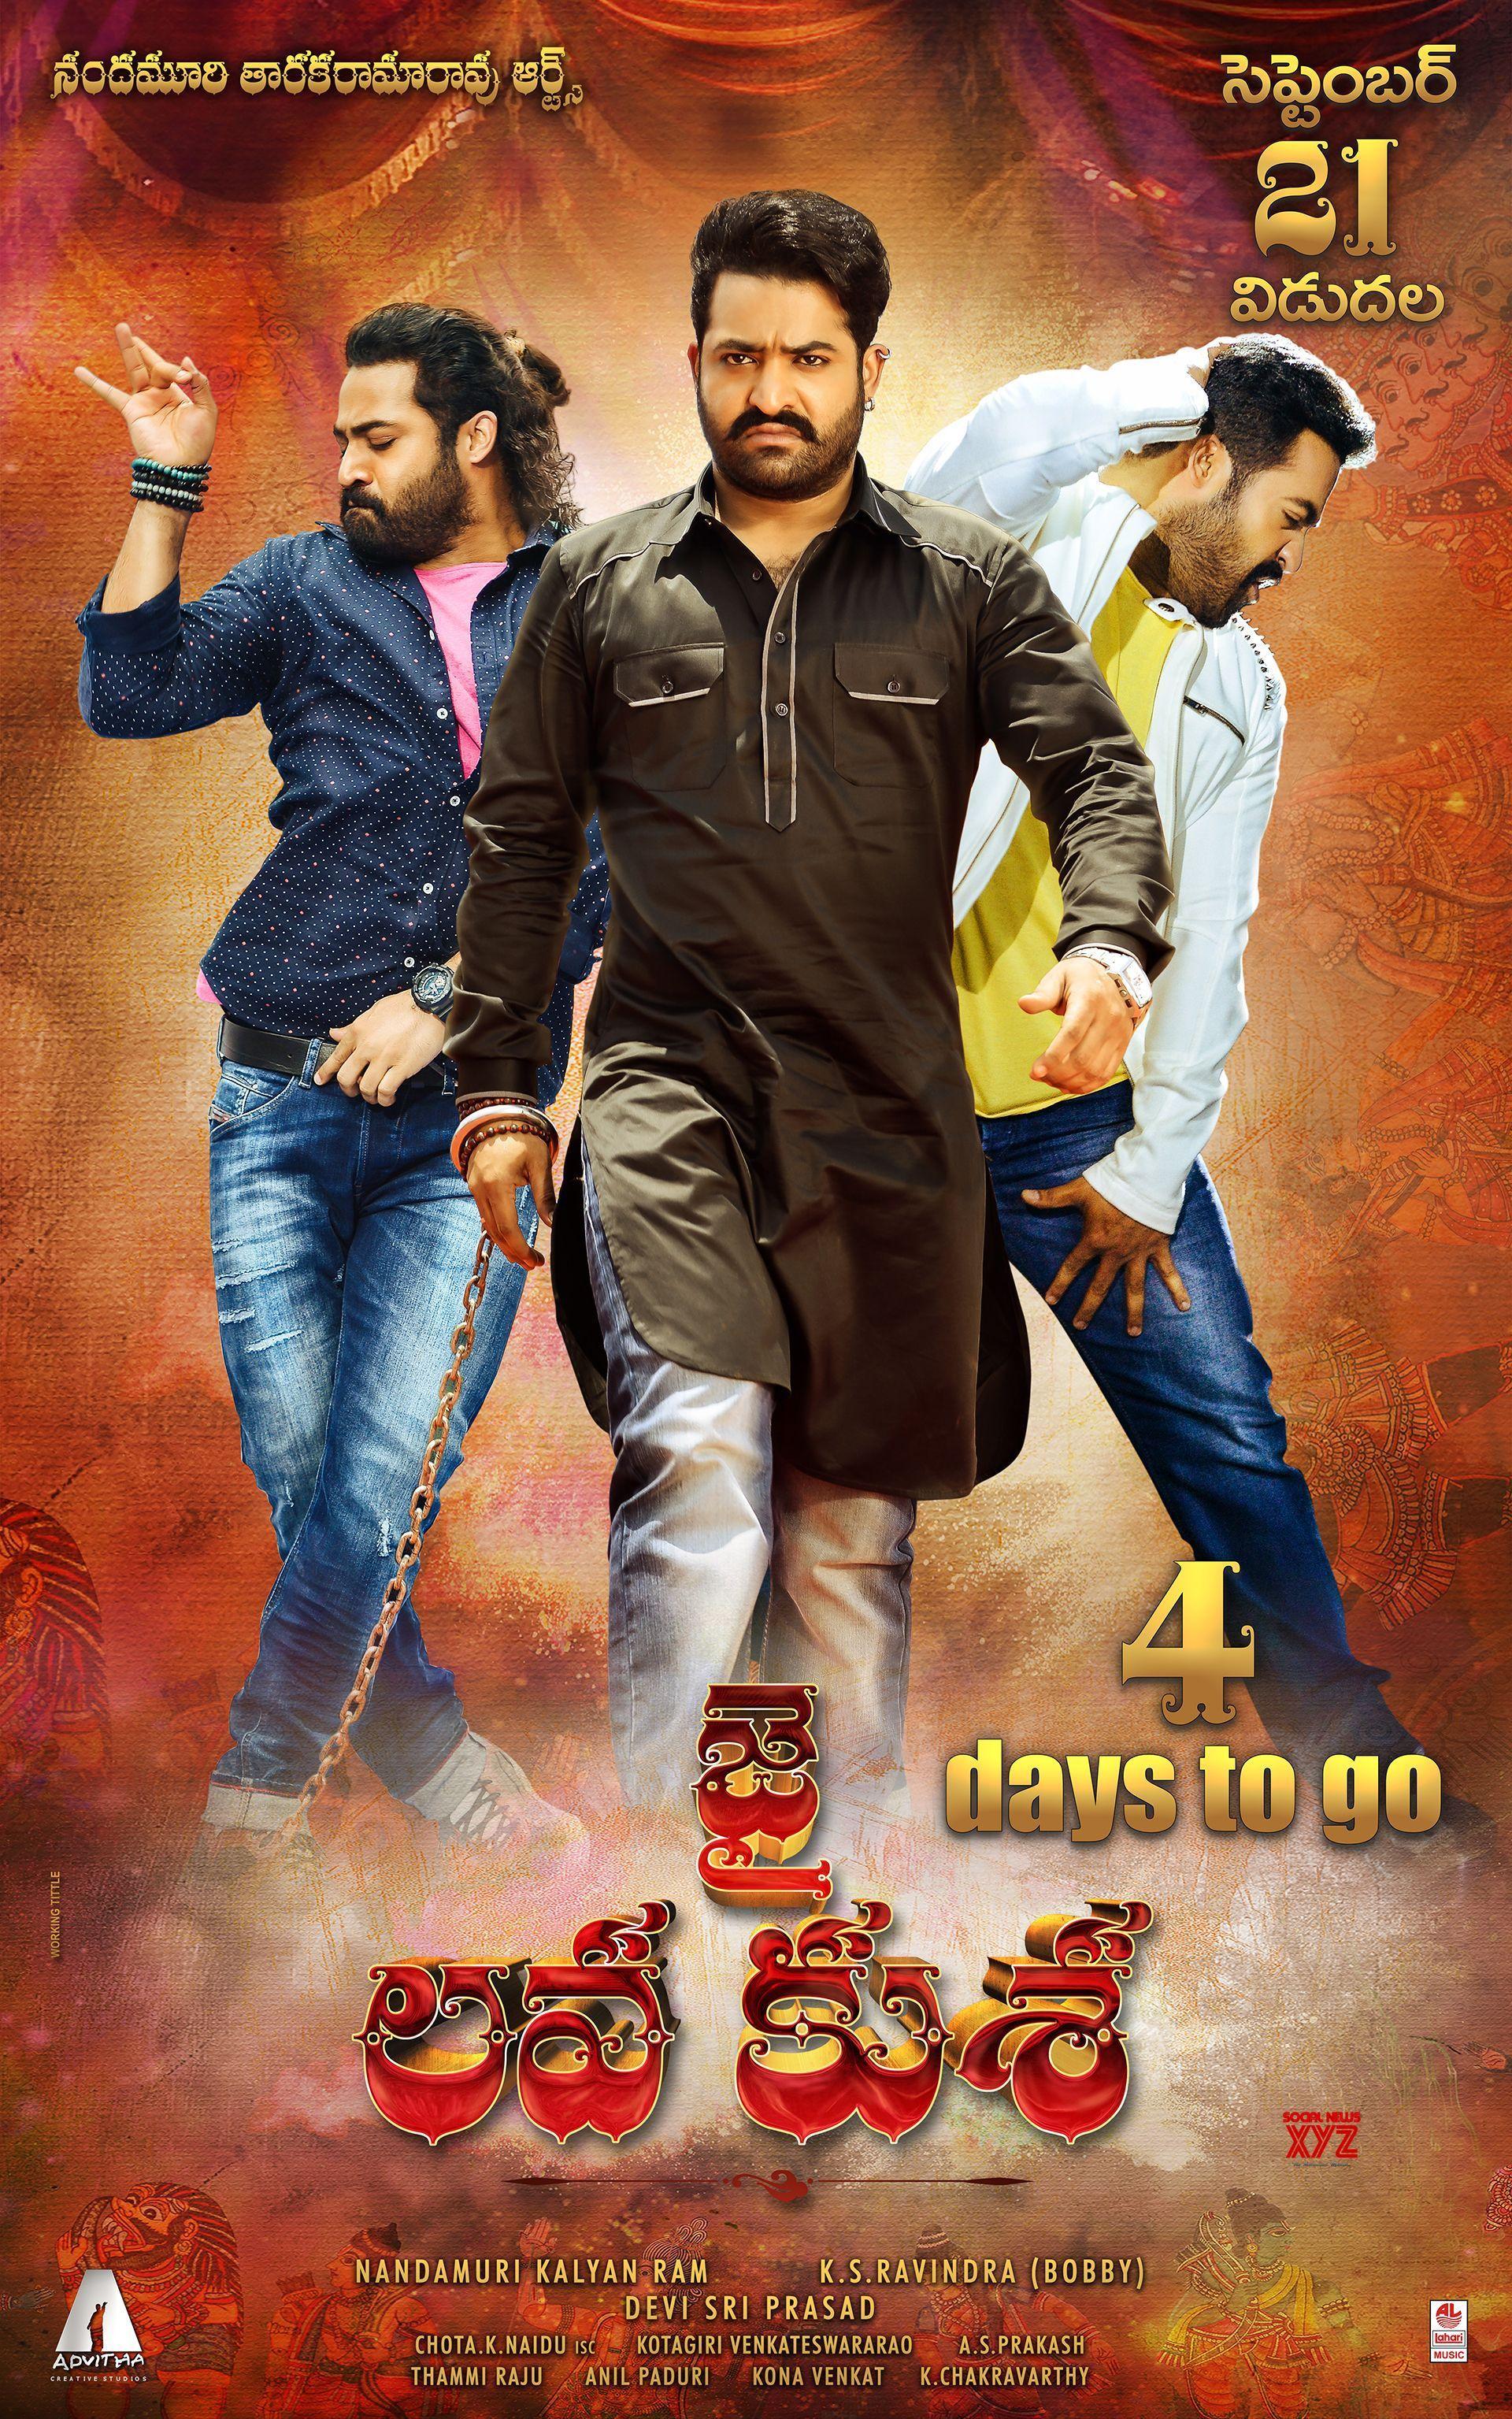 Jai Lava Kusa New Release Hd Wallpapers Telugu Movies Download